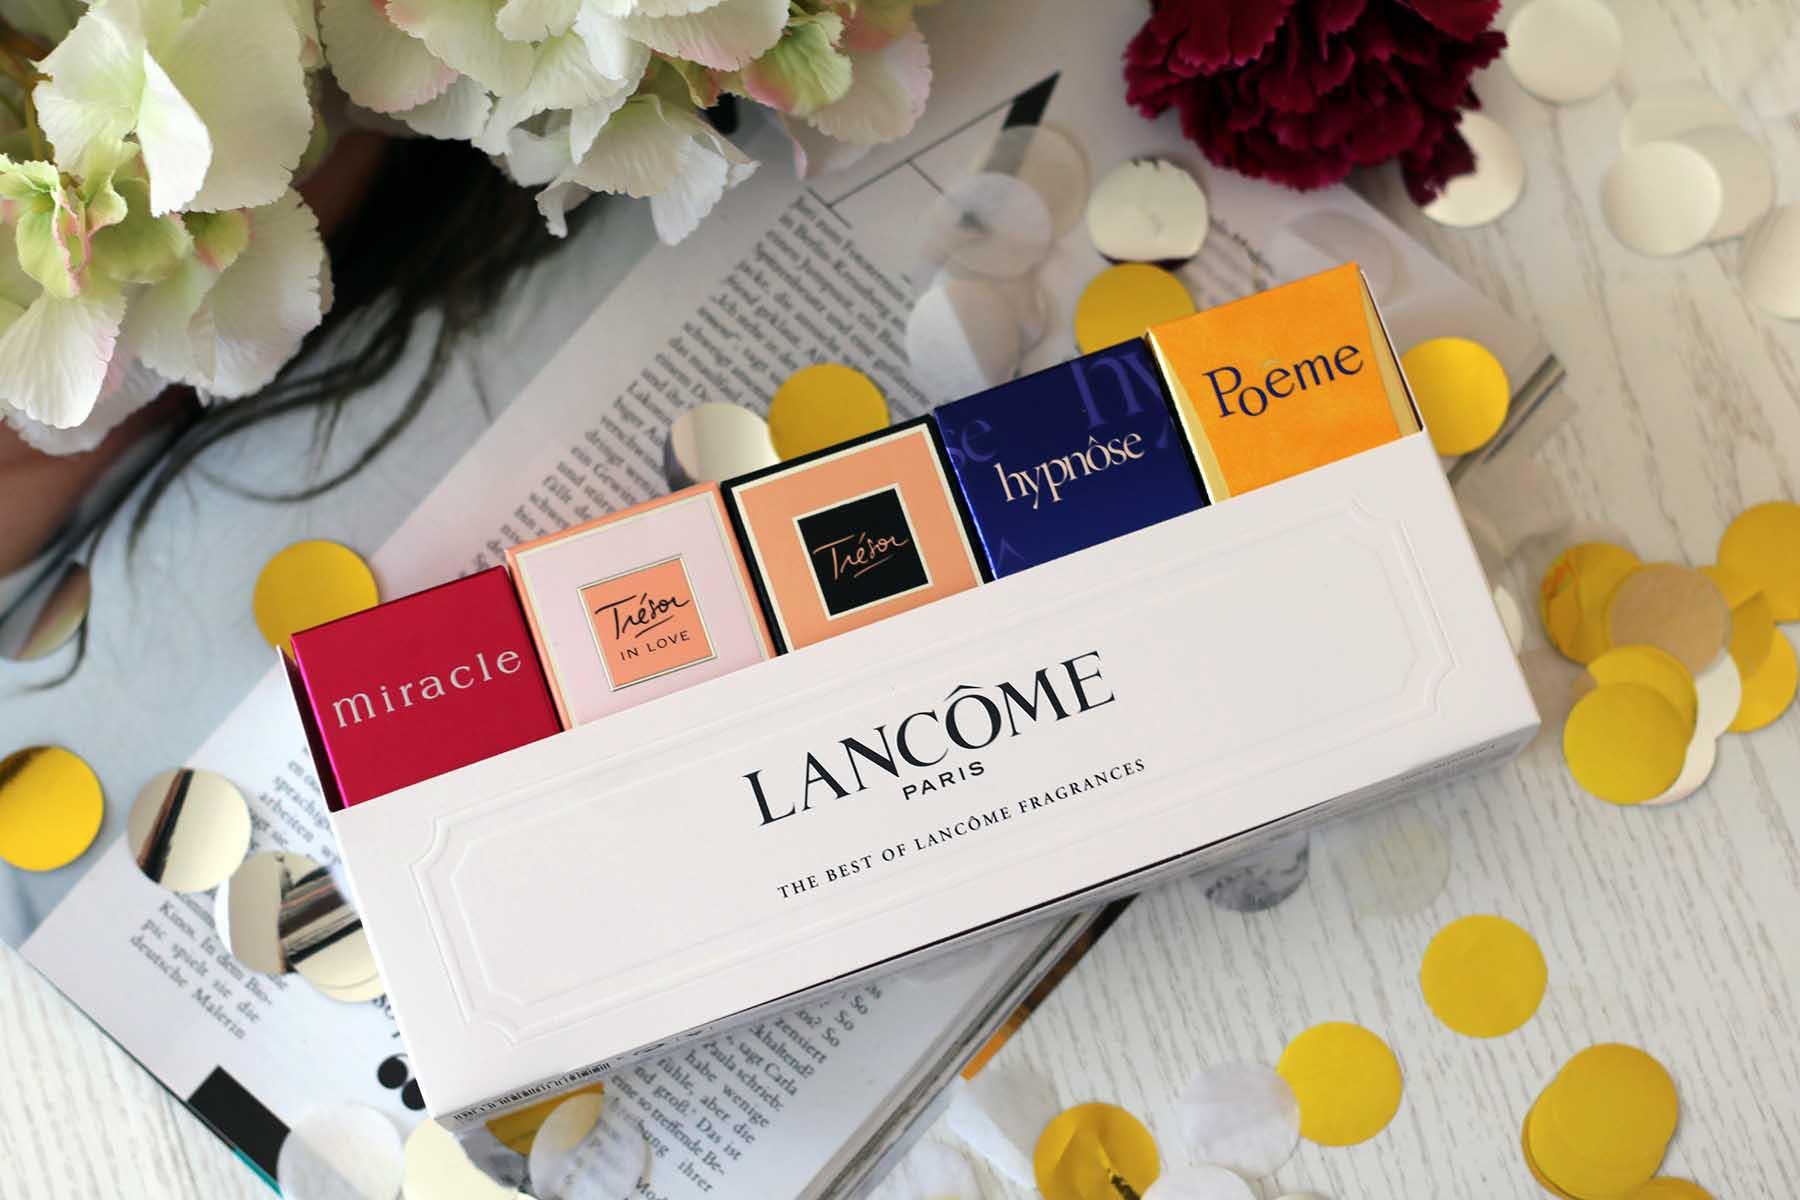 duty-free-shop-düsseldorf-worlddutyfree-yves-saint-laurent-parfüm-manifesto-beautyblog11